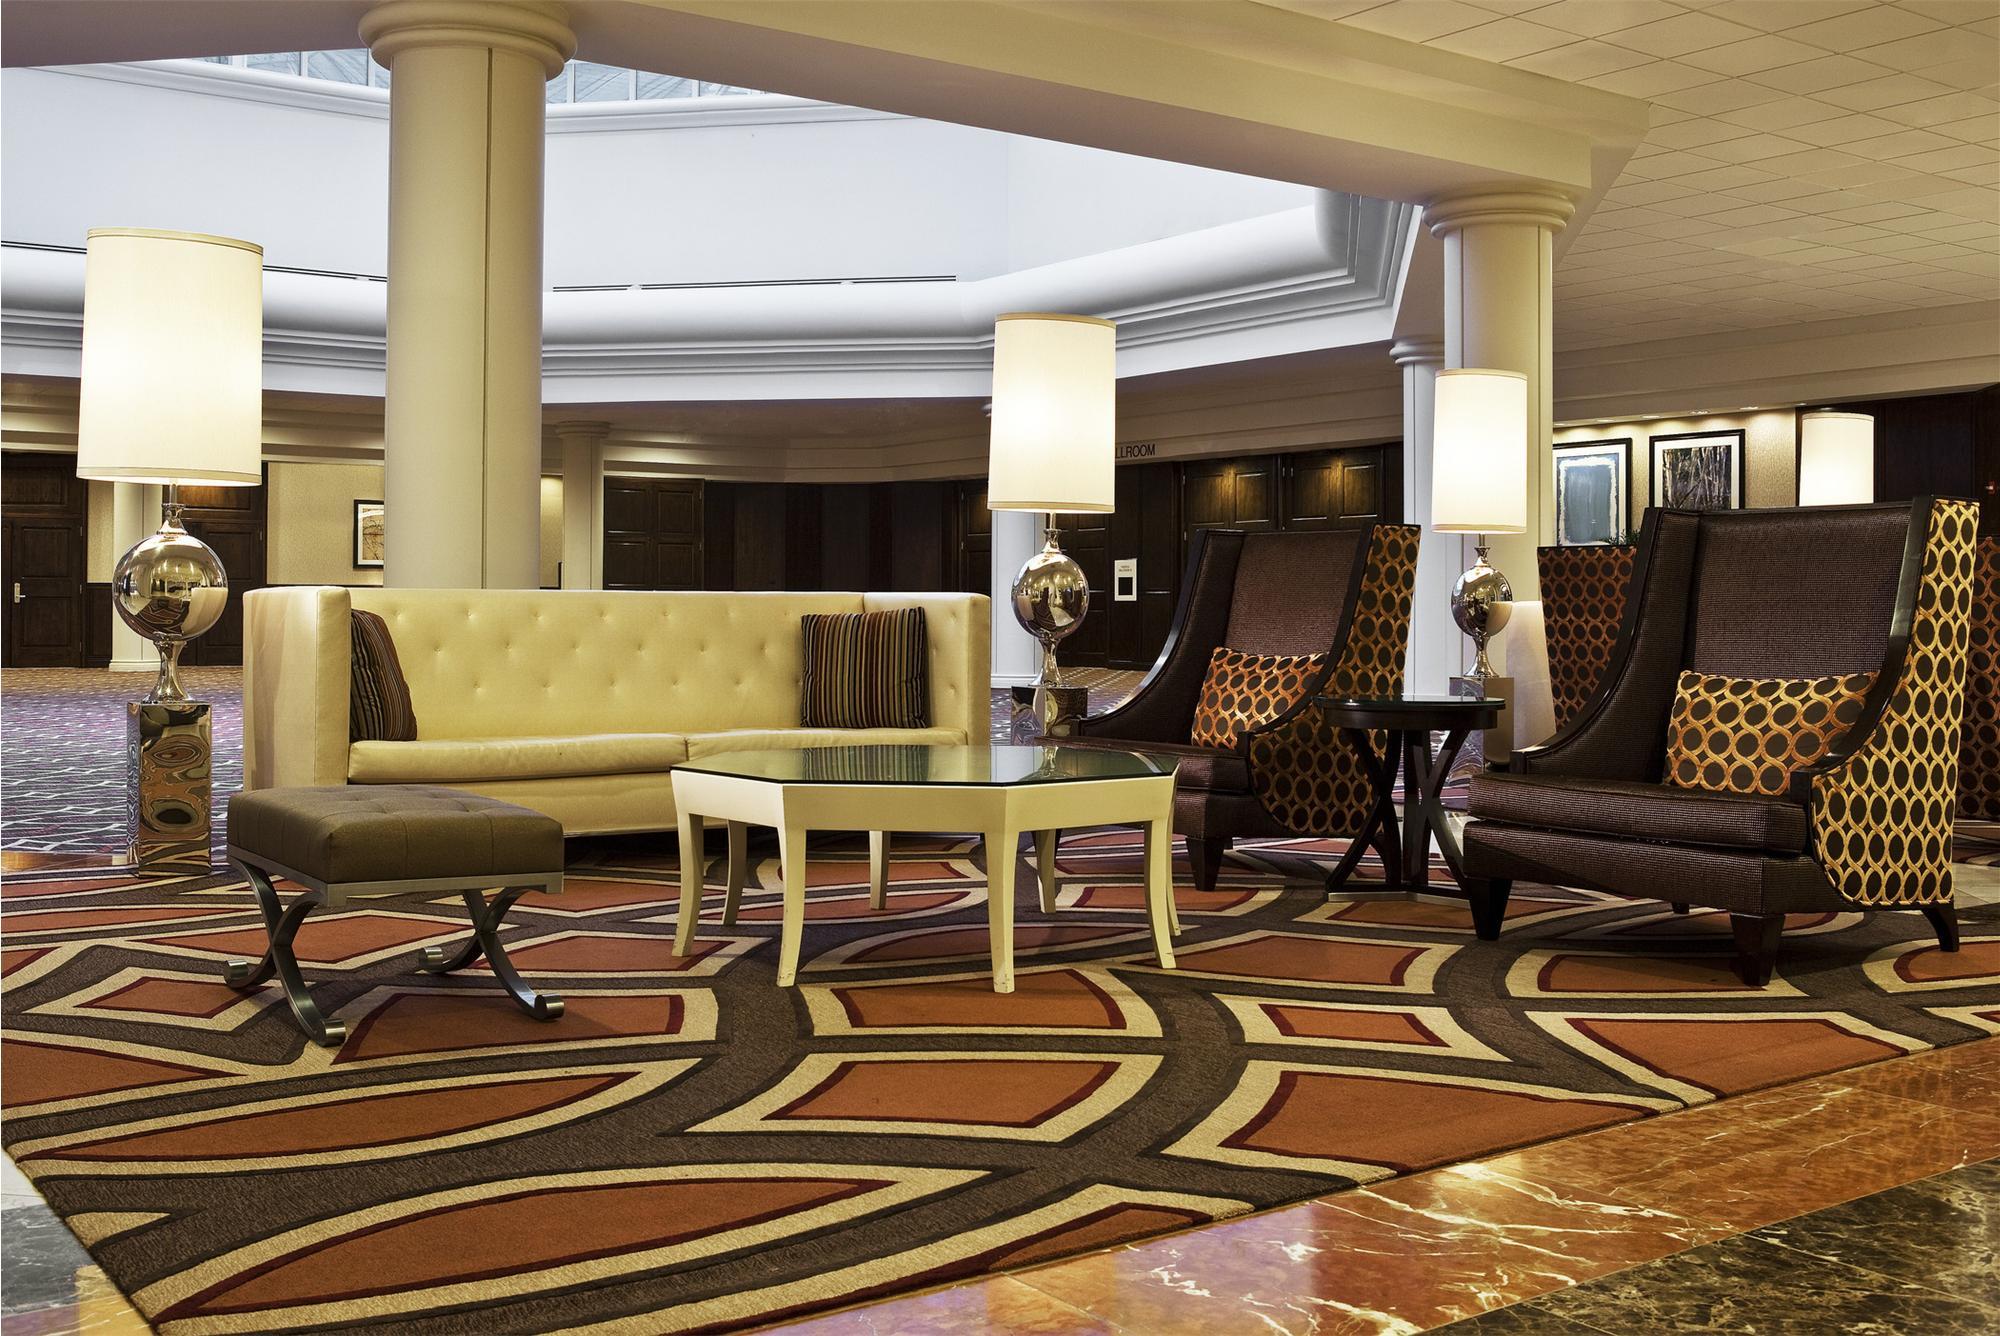 Hotel in Towson, MD   Sheraton Baltimore North Hotel